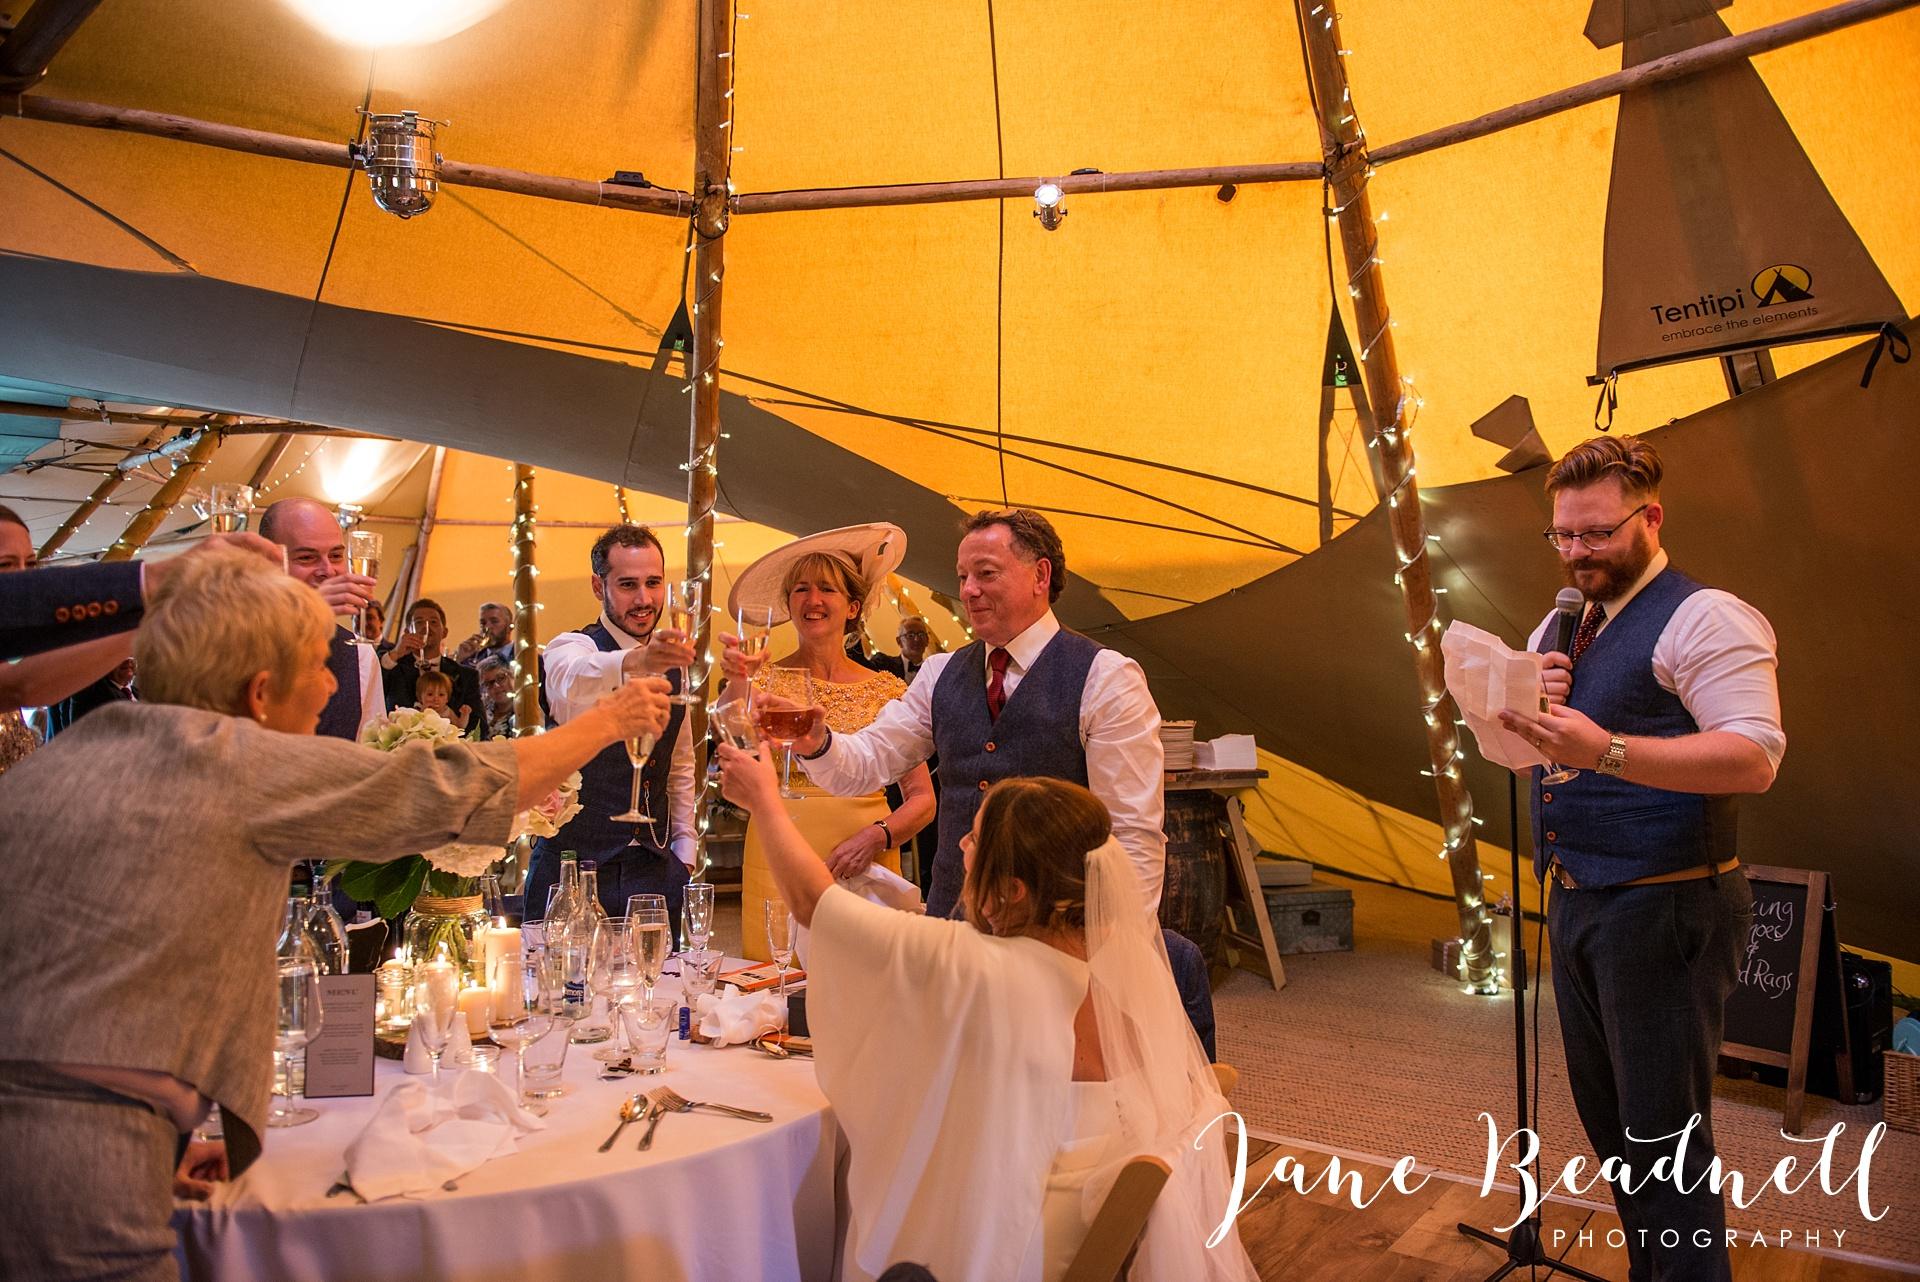 fine-art-wedding-photographer-jane-beadnell-yorkshire-wedding-photographer_0142